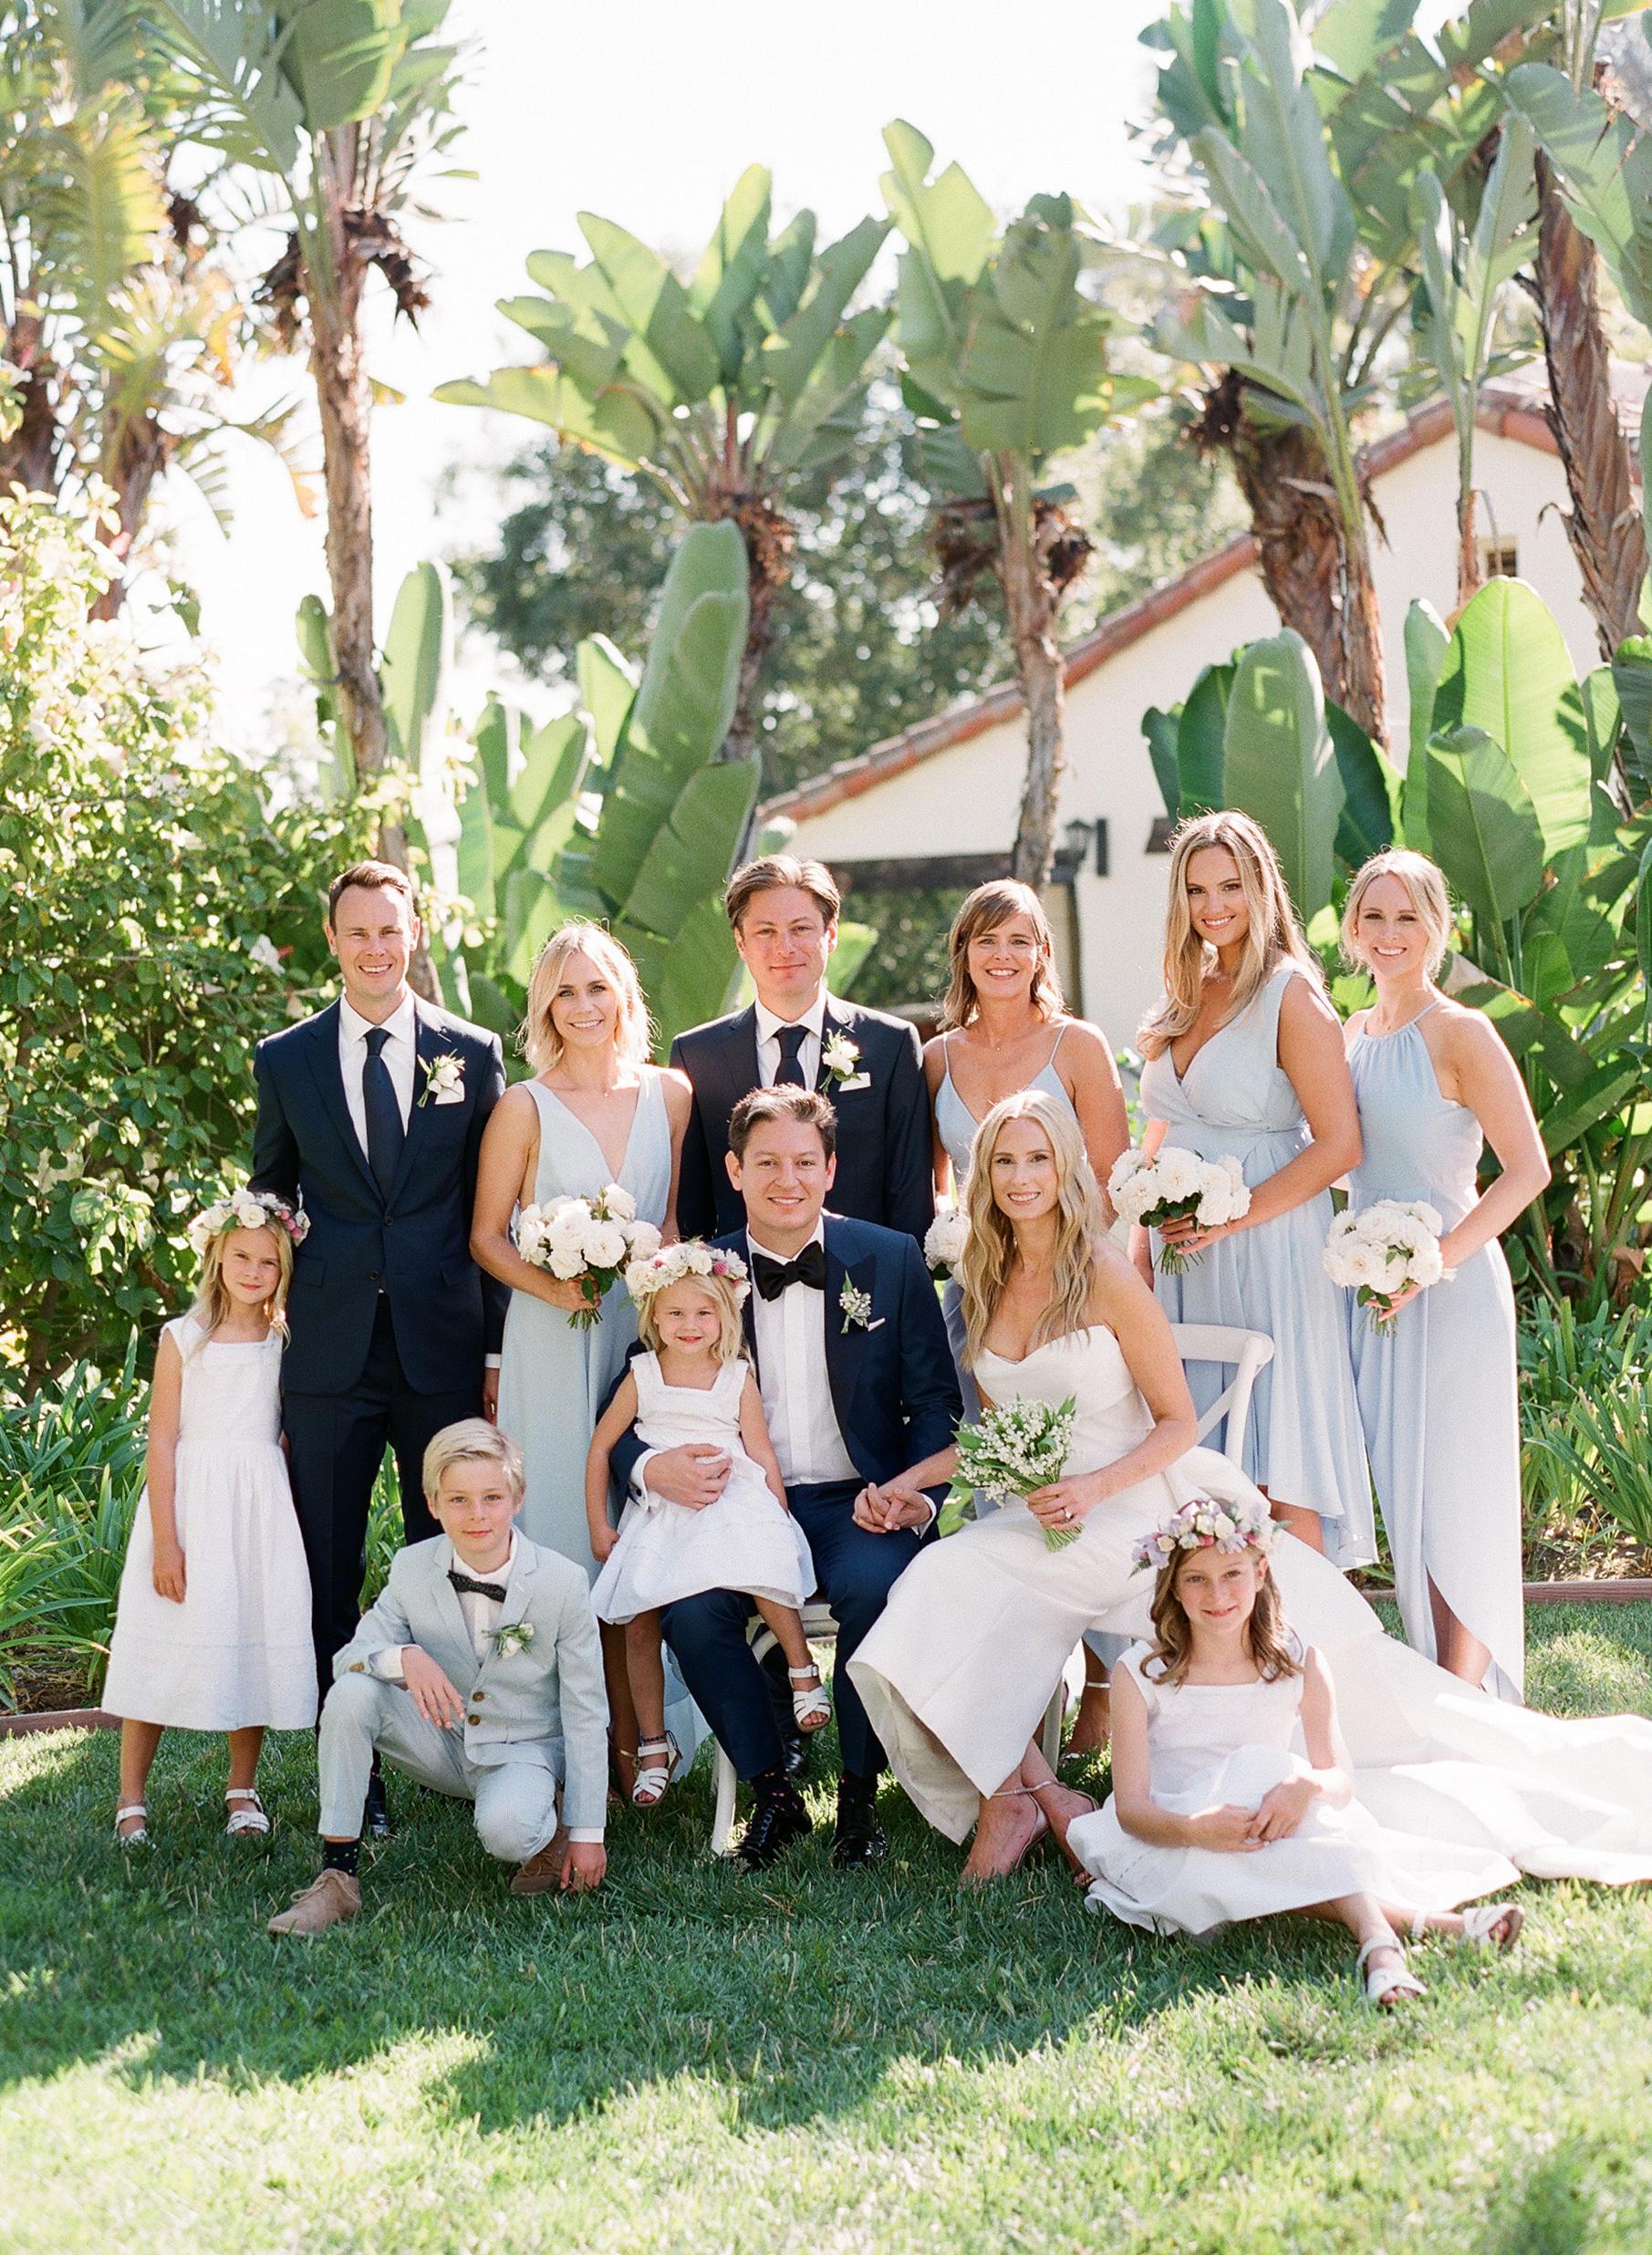 katy michael wedding party